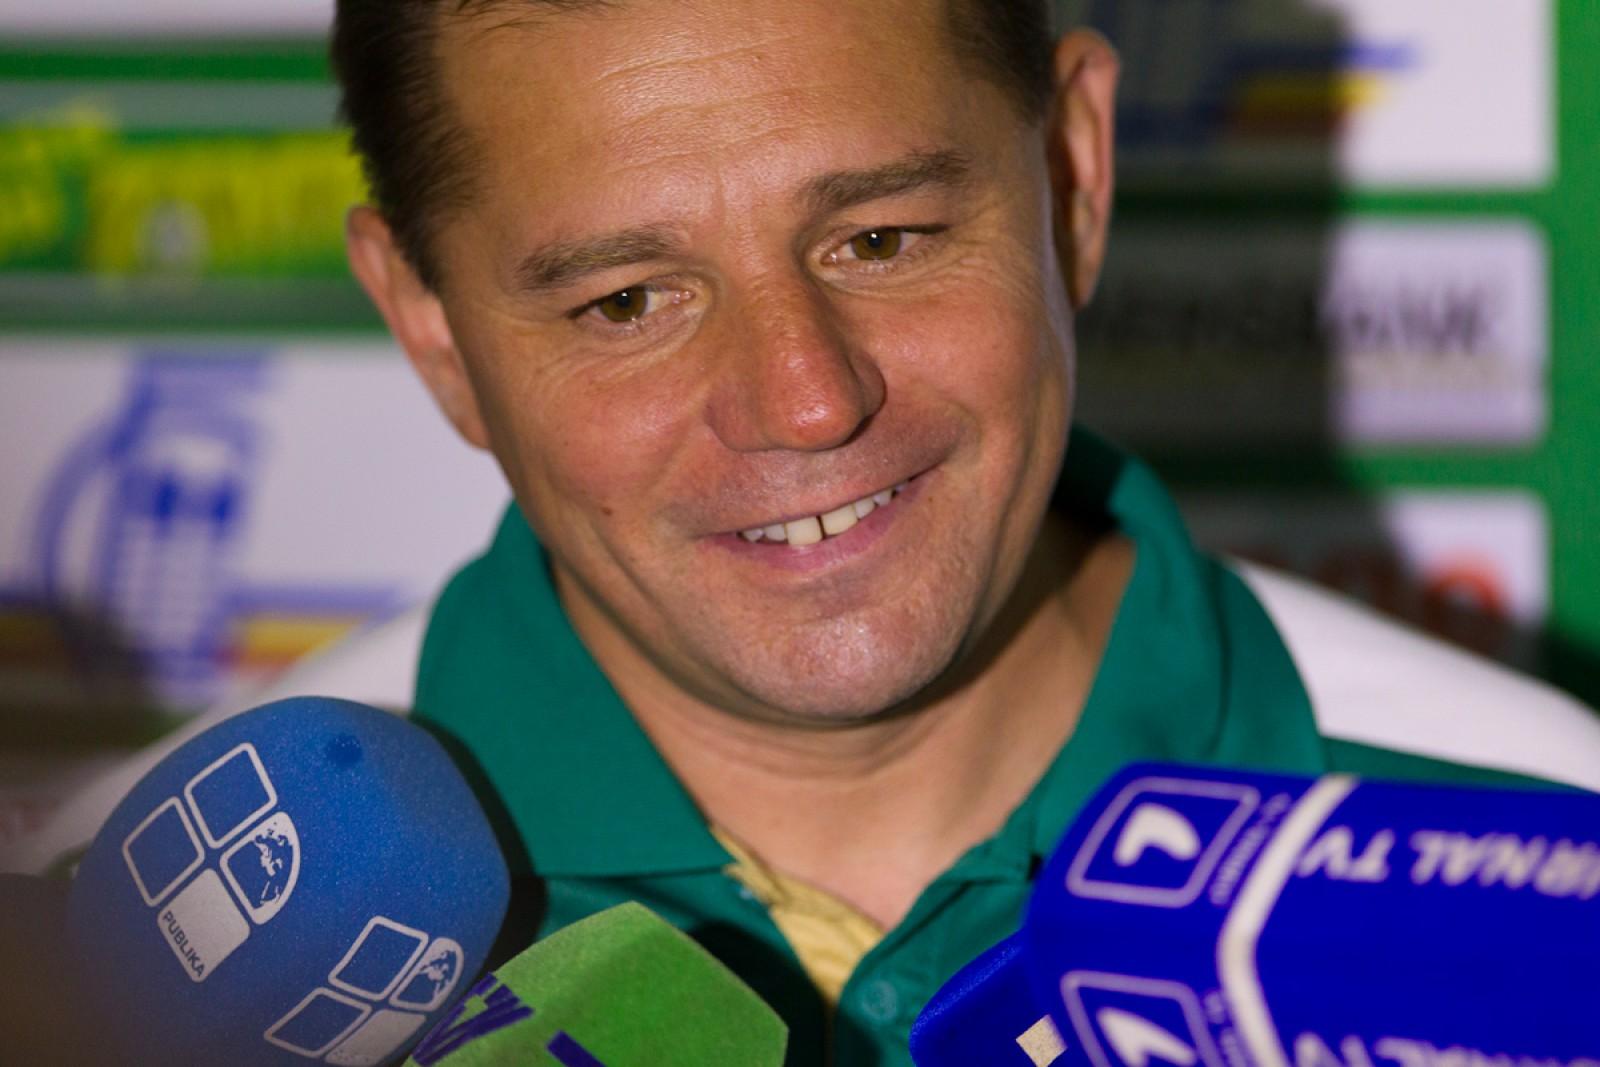 Oficial: Sergiu Cleșcenco a devenit noul antrenor al naționalei de tineret a Moldovei